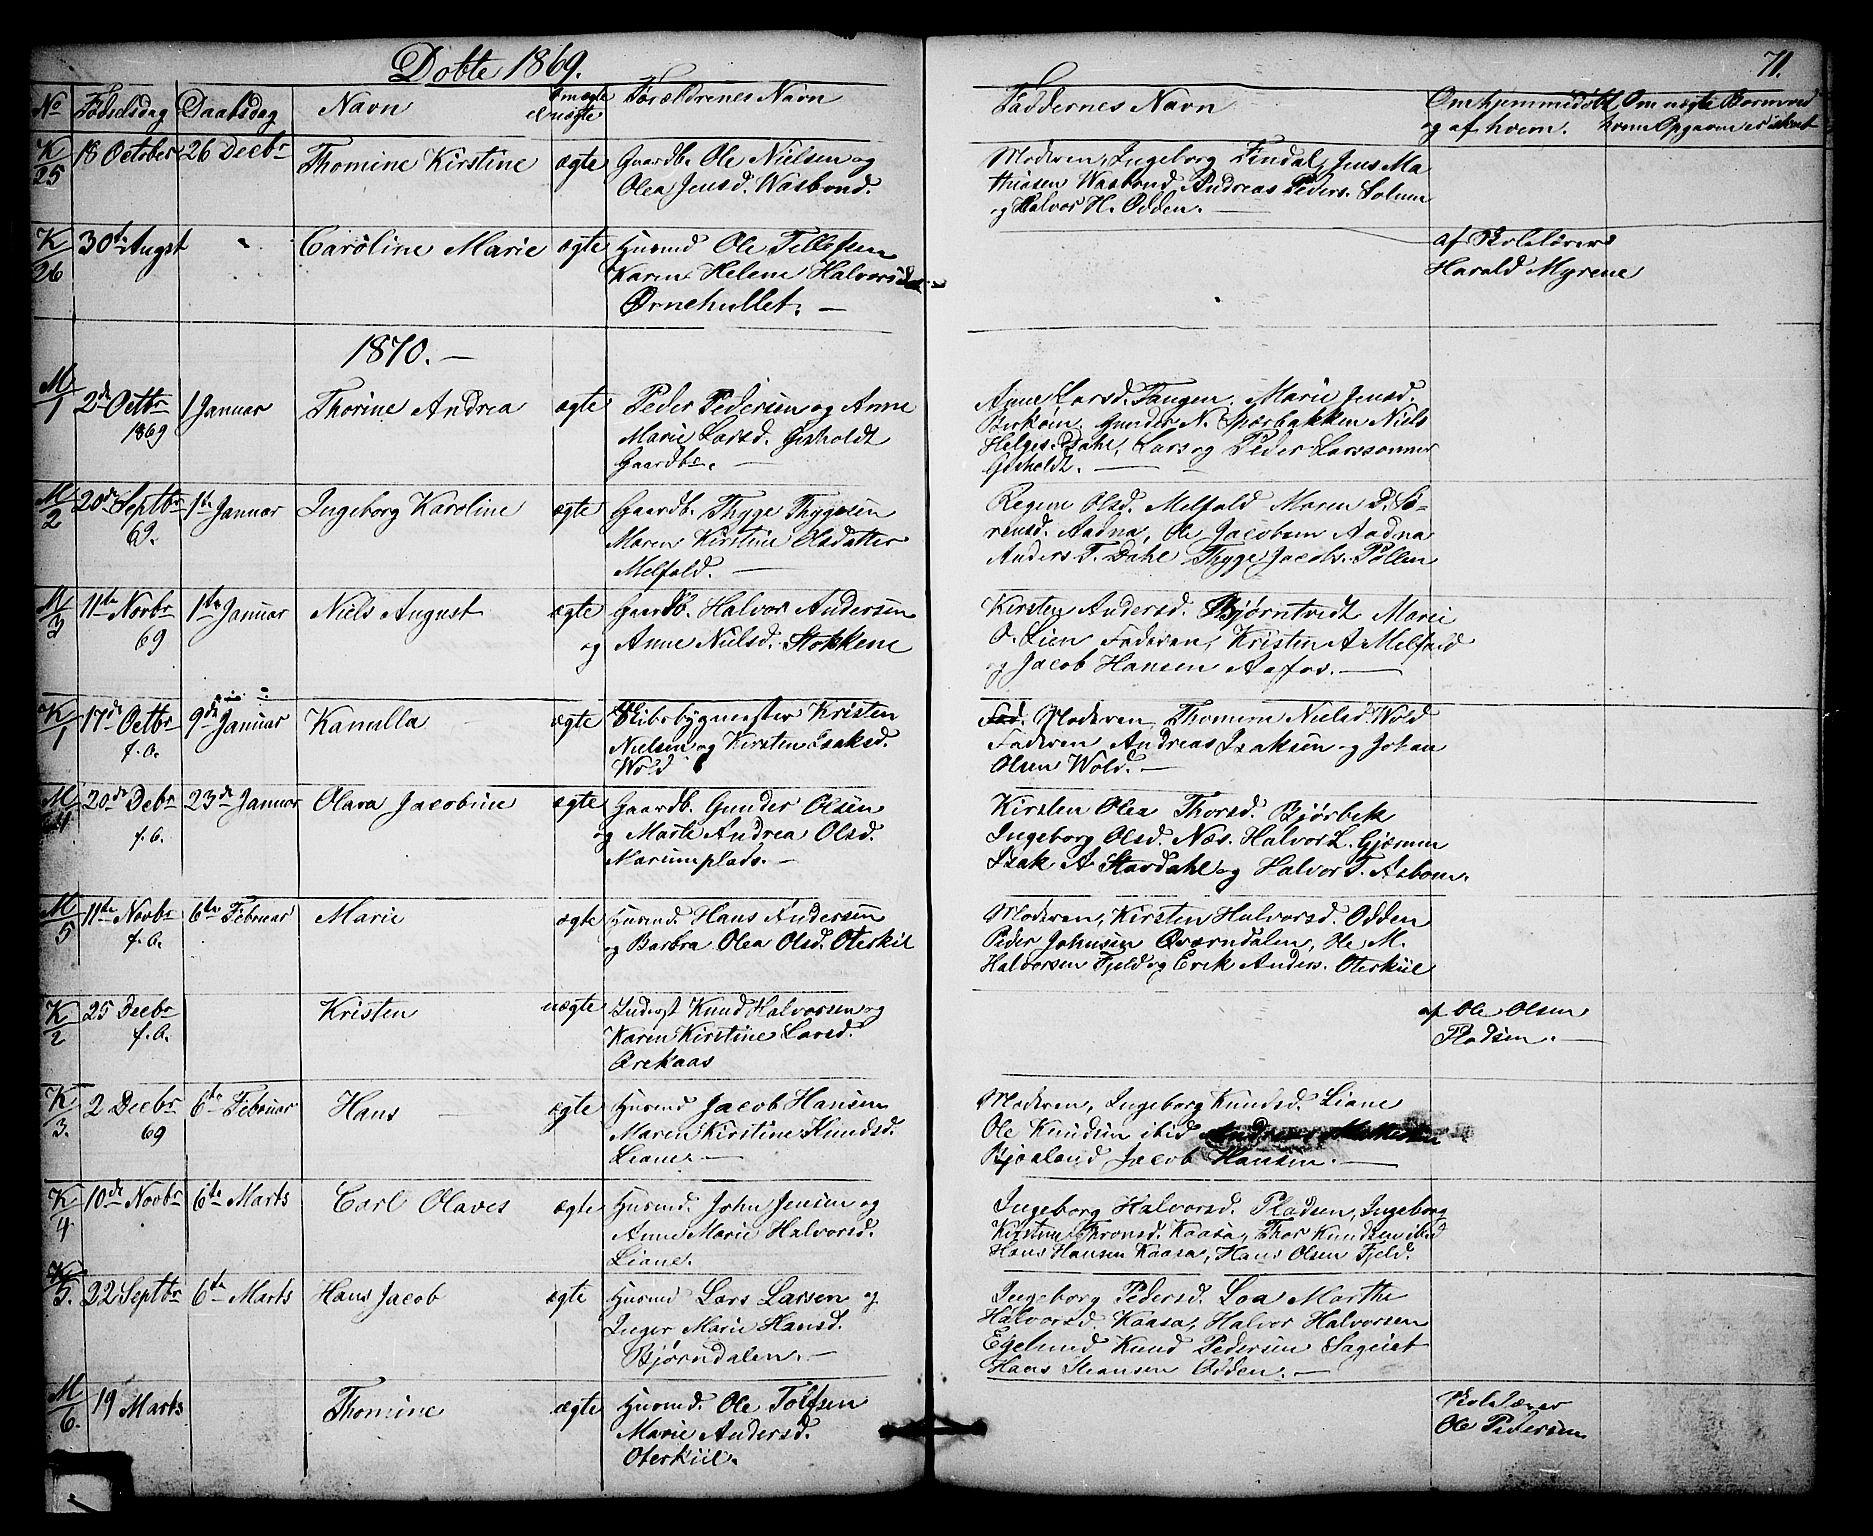 SAKO, Solum kirkebøker, G/Gb/L0002: Klokkerbok nr. II 2, 1859-1879, s. 71